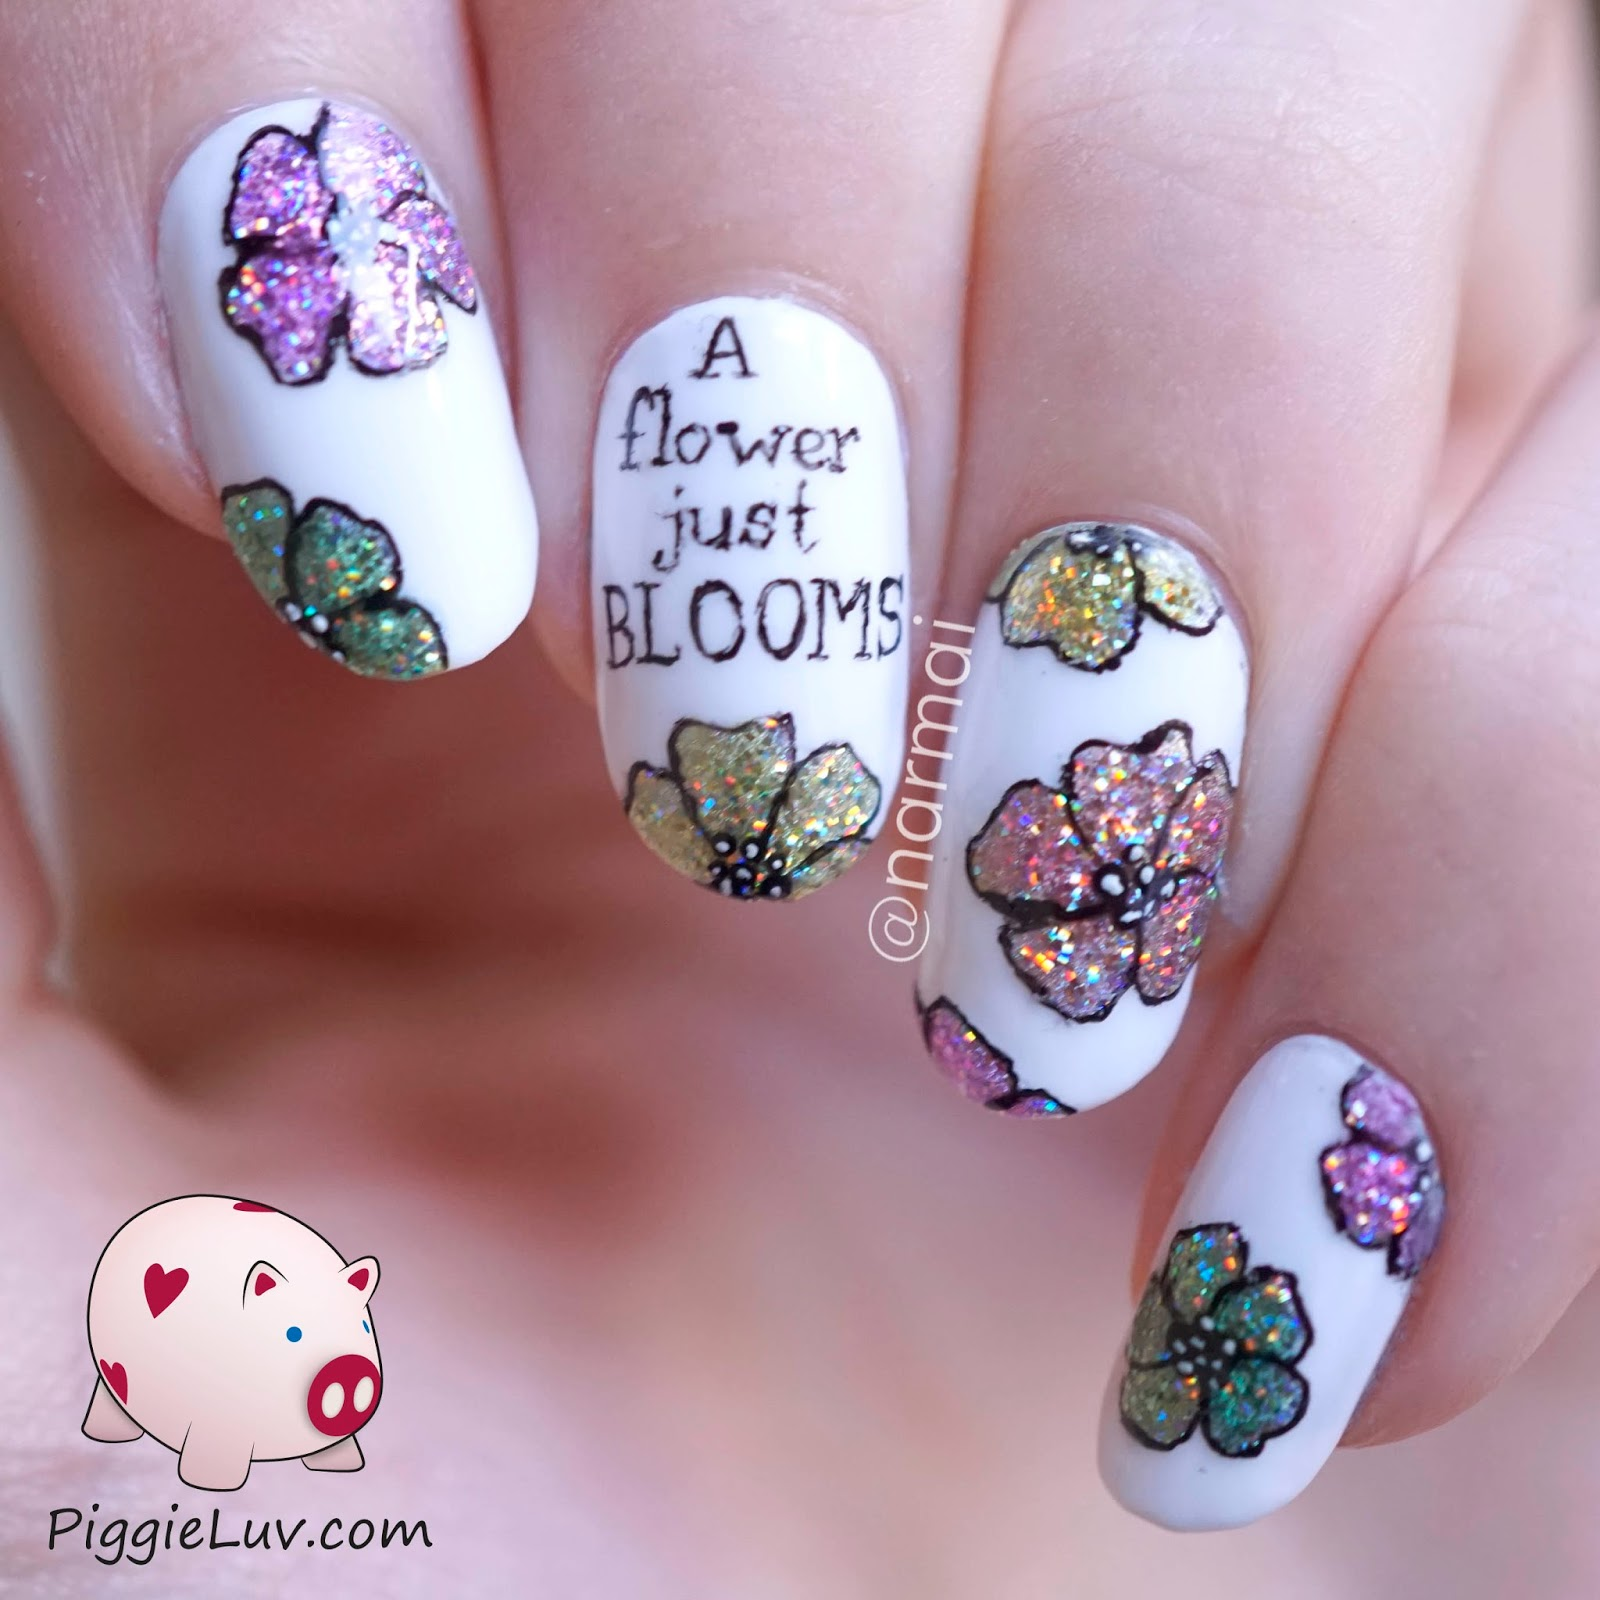 Nail Art Quotes: PiggieLuv: 'A Flower Just Blooms' Glitter Nail Art